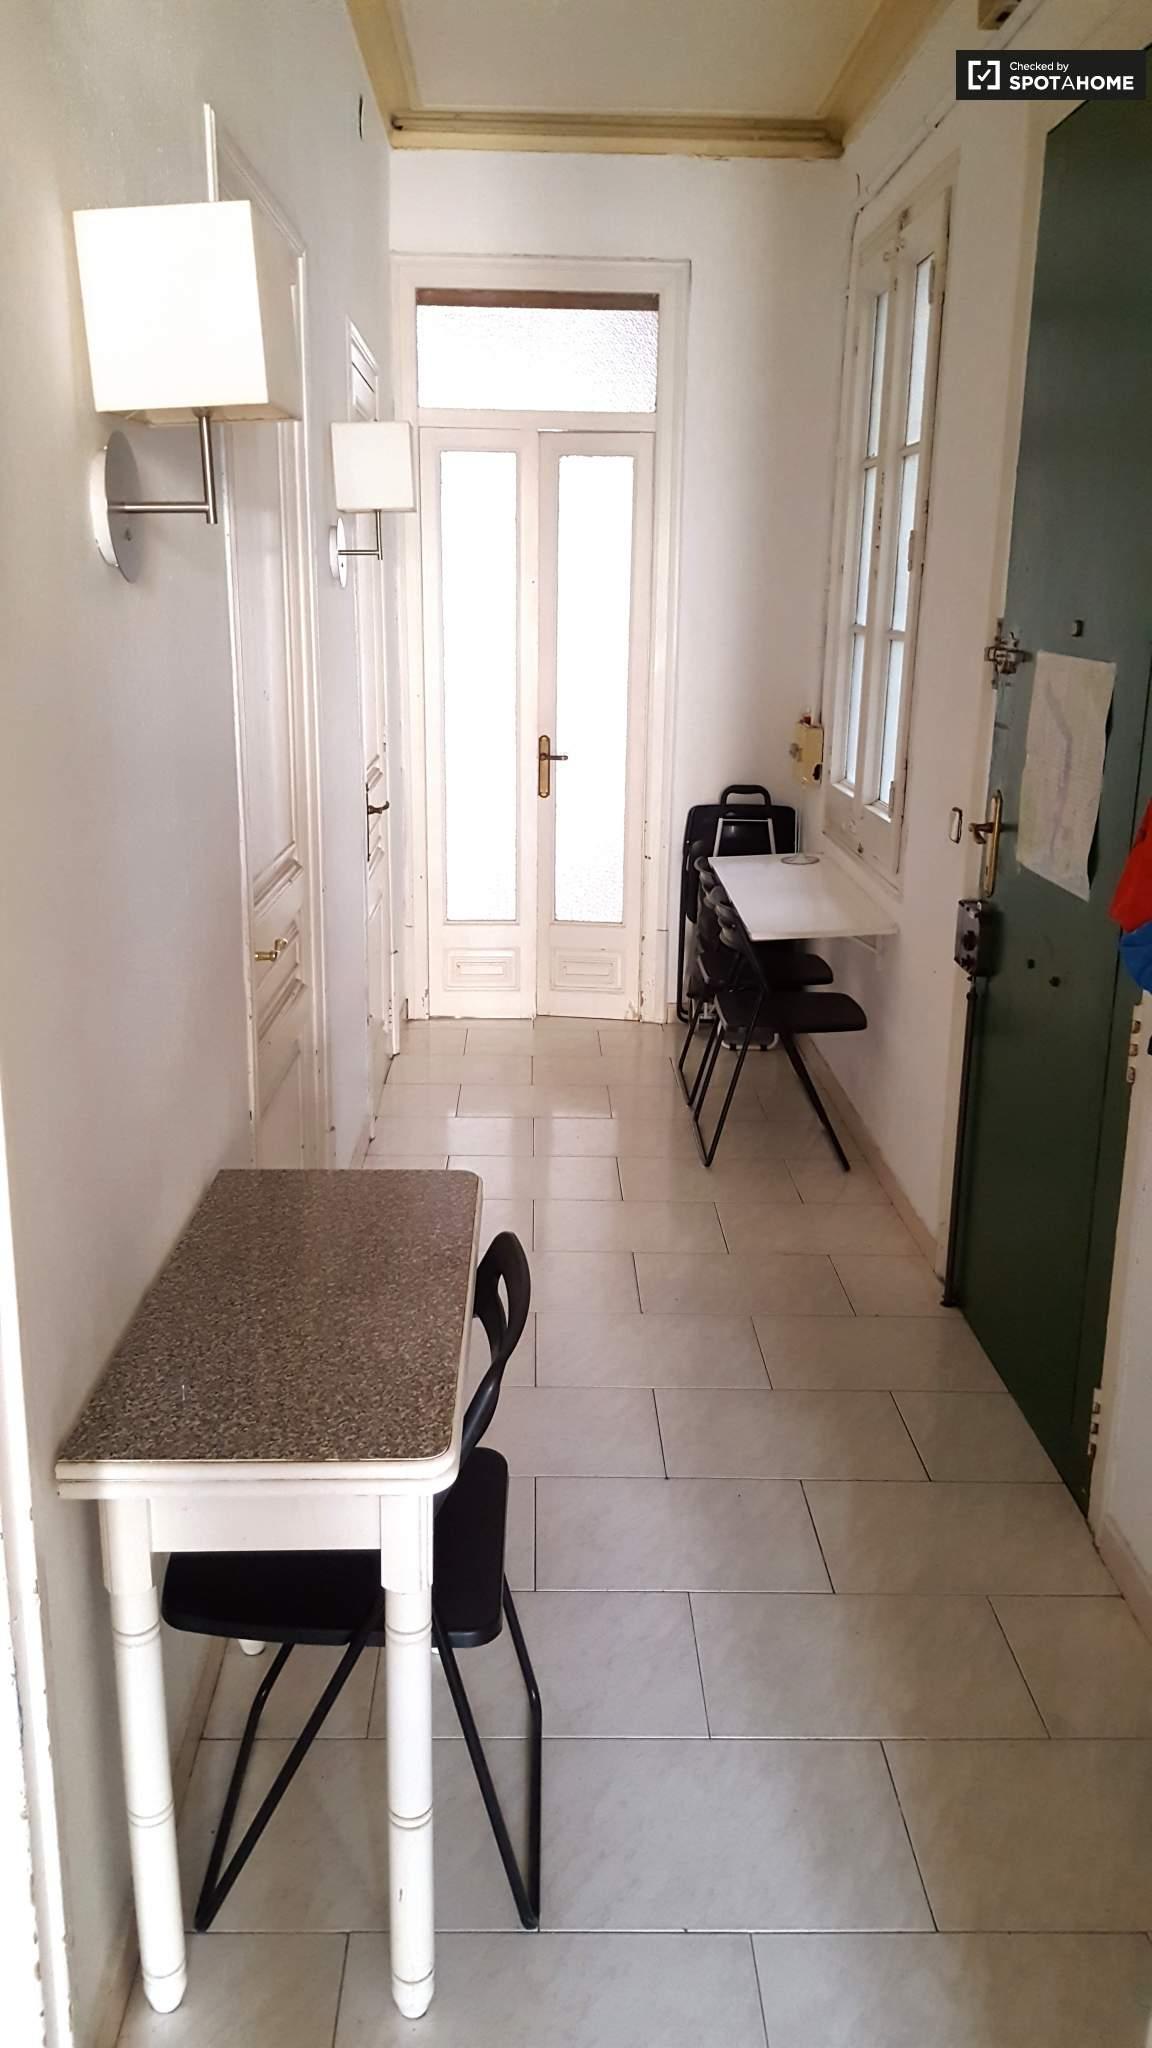 Corridor/Dining room